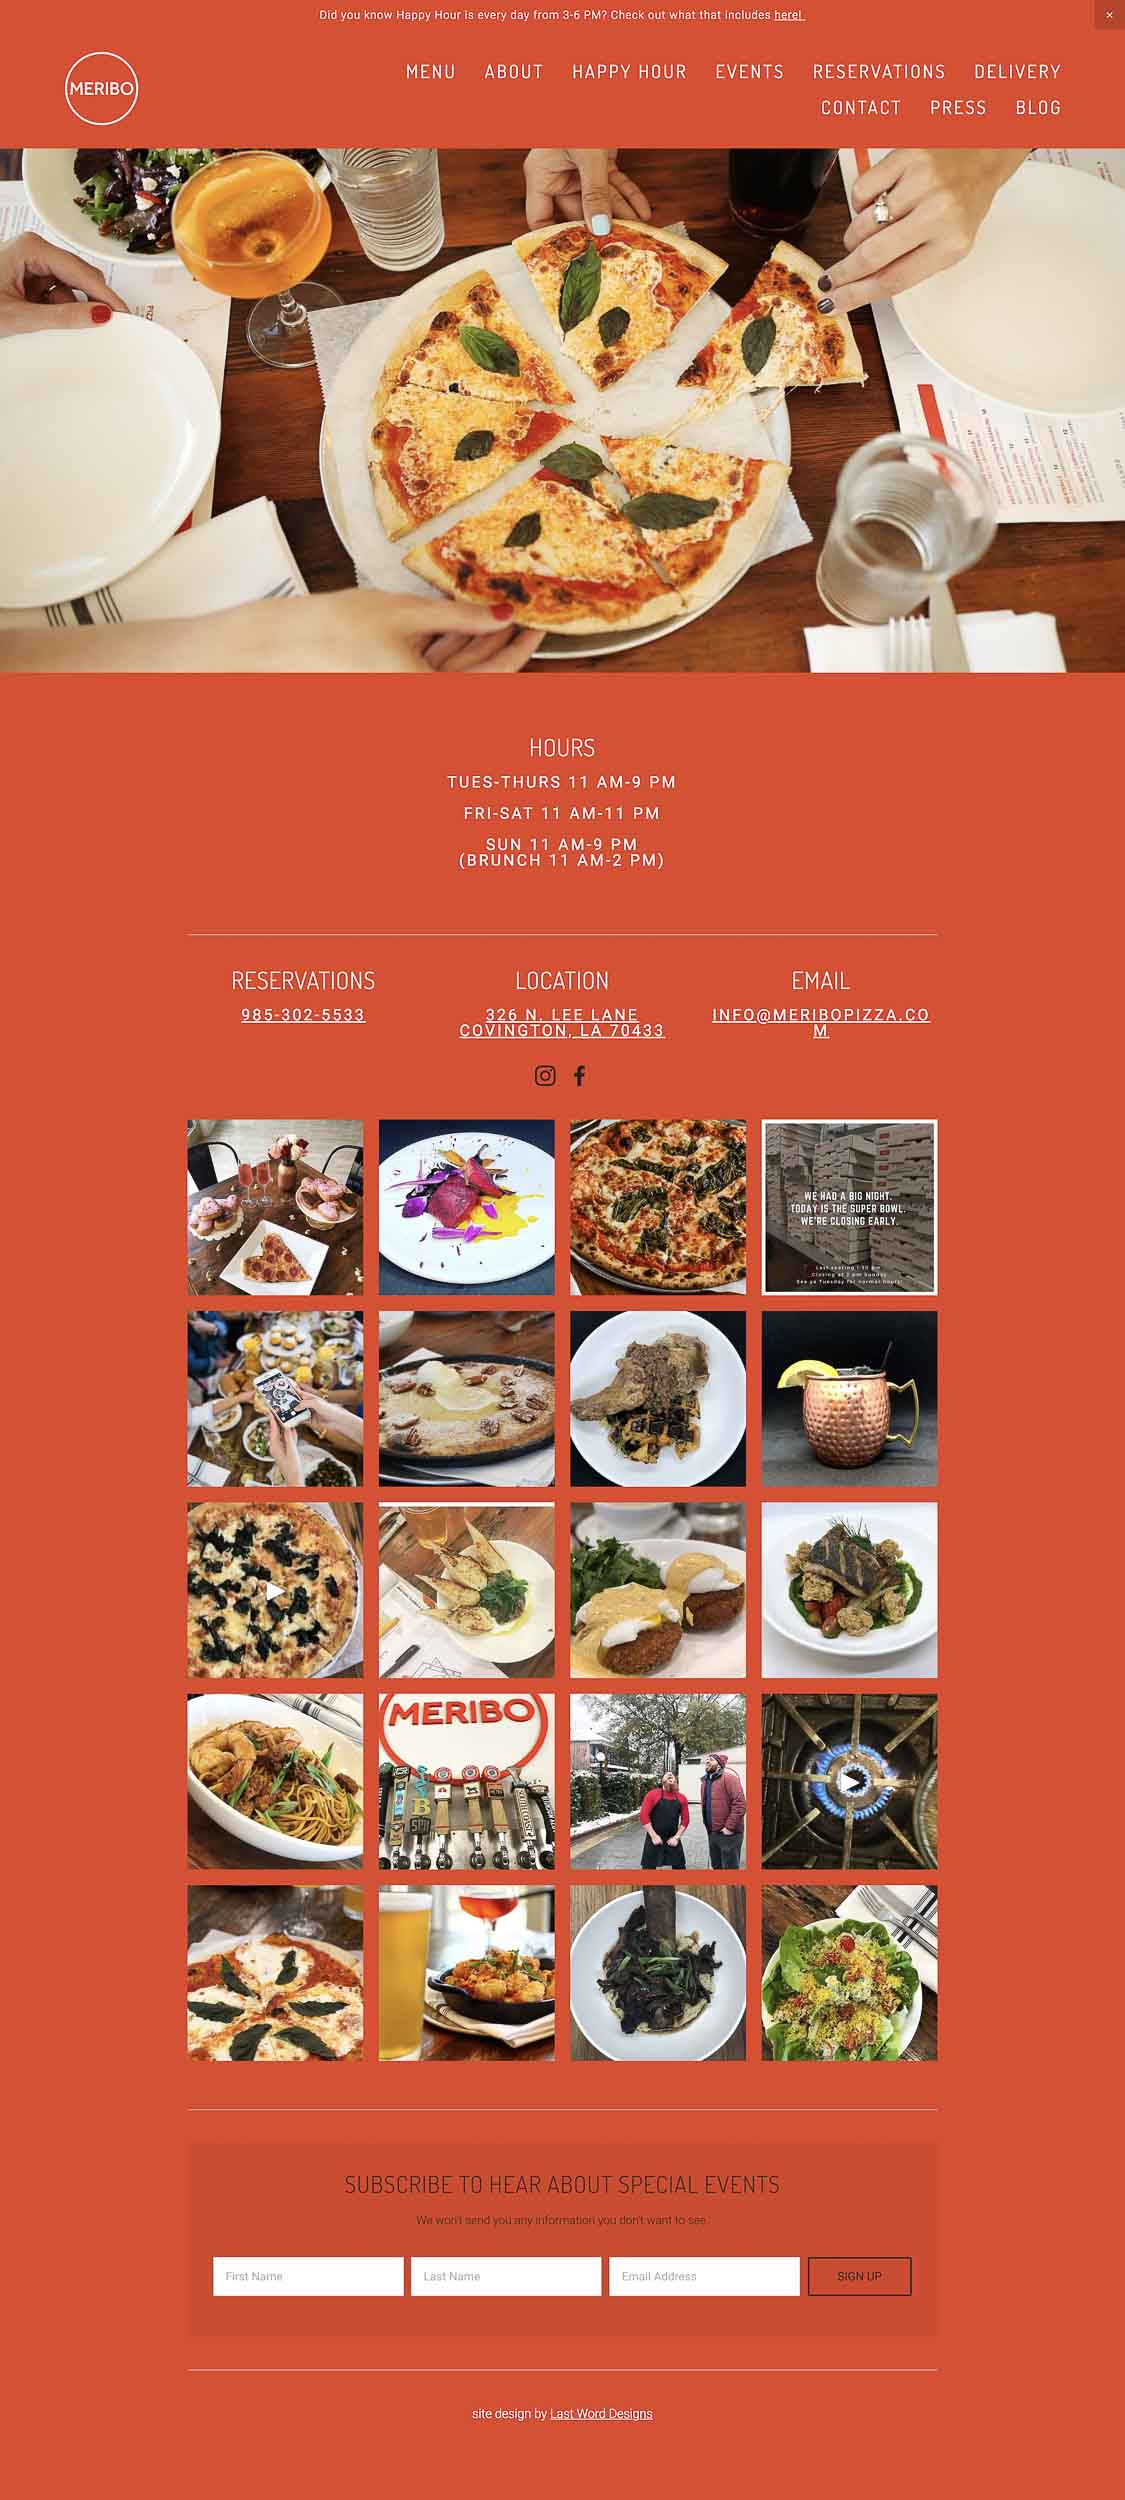 Last Word Designs Meribo Pizza - Squarespace.jpg